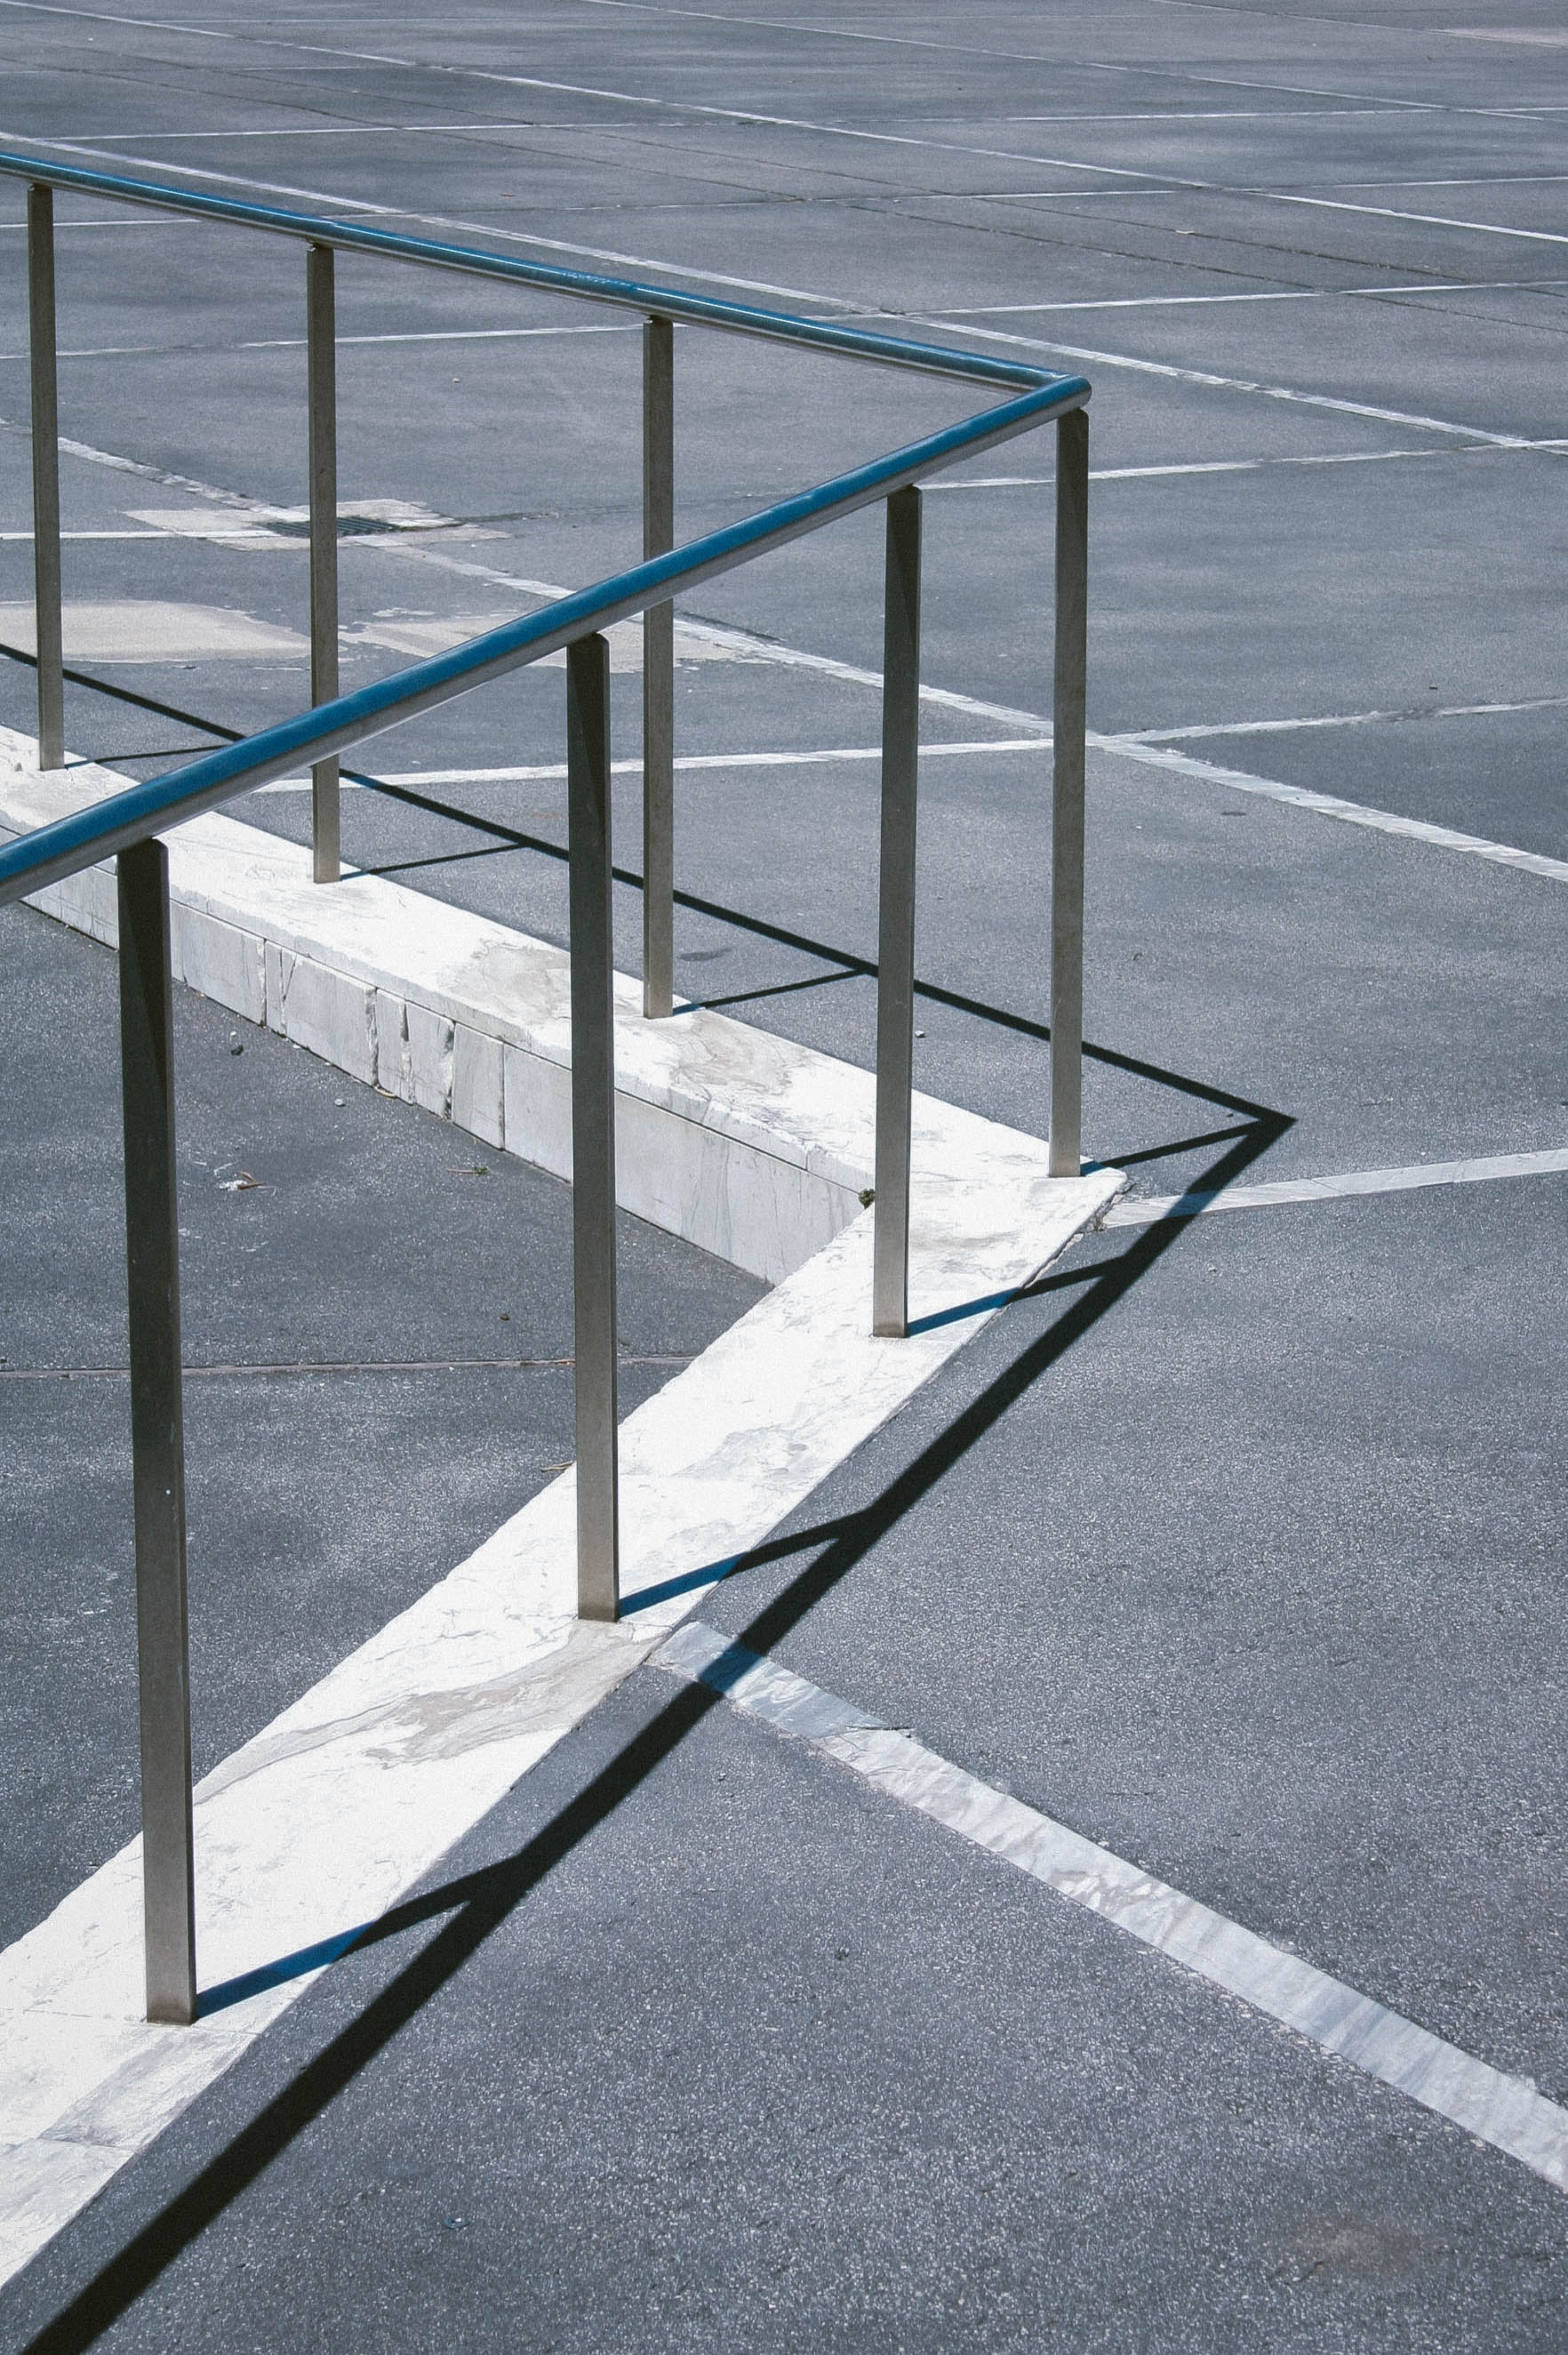 architecture-asphalt-contemporary-125171